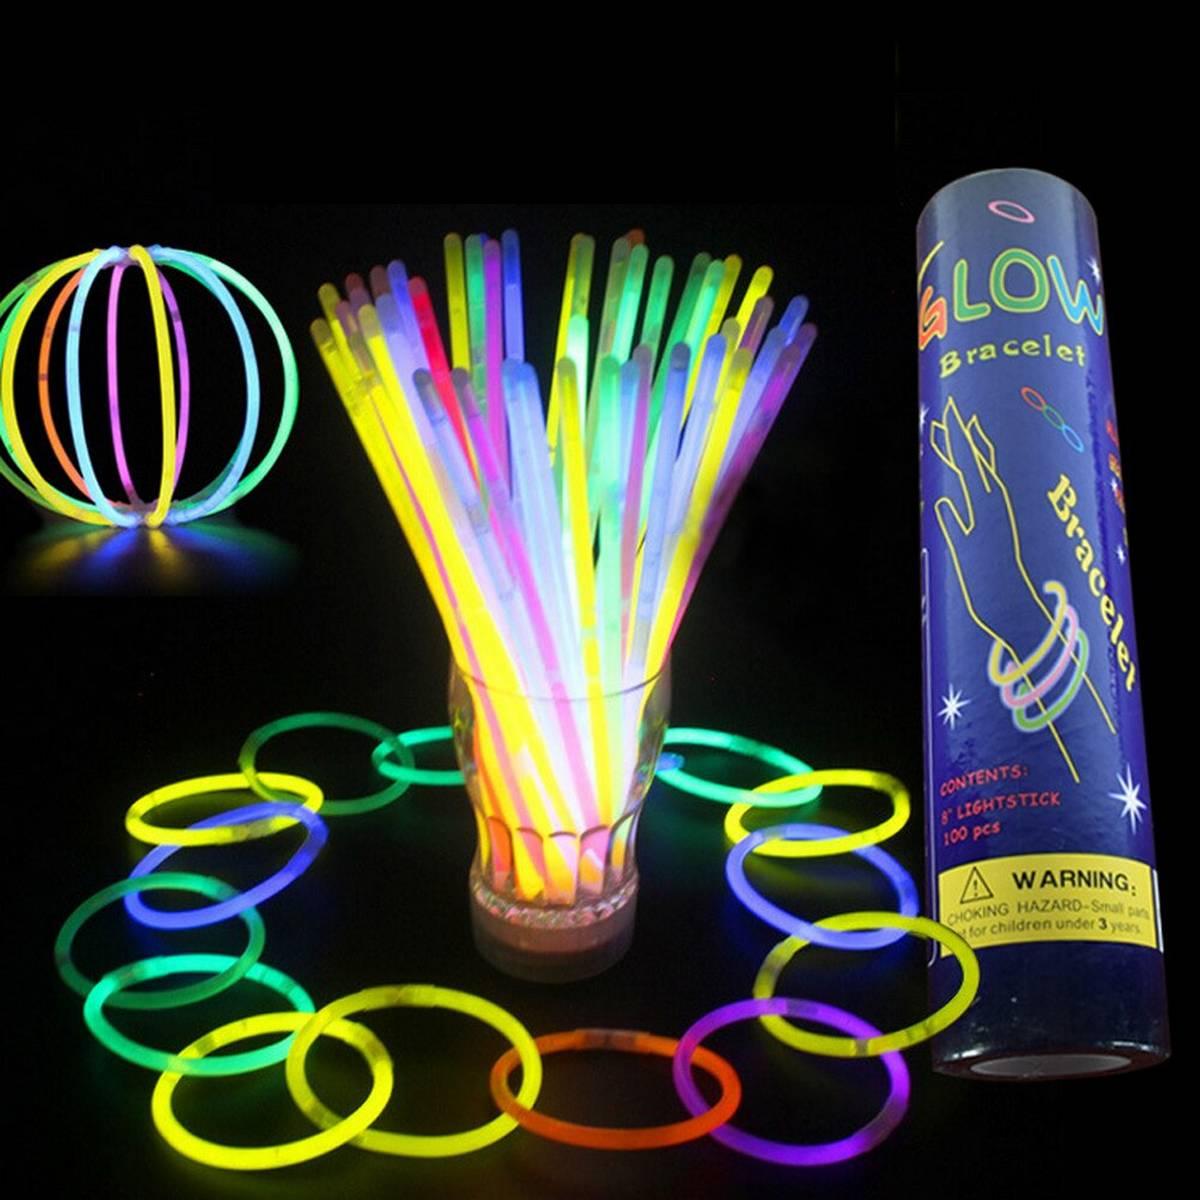 20 Pcs Glowing Sticks Bracelets Multicolor Stick for Wedding Party